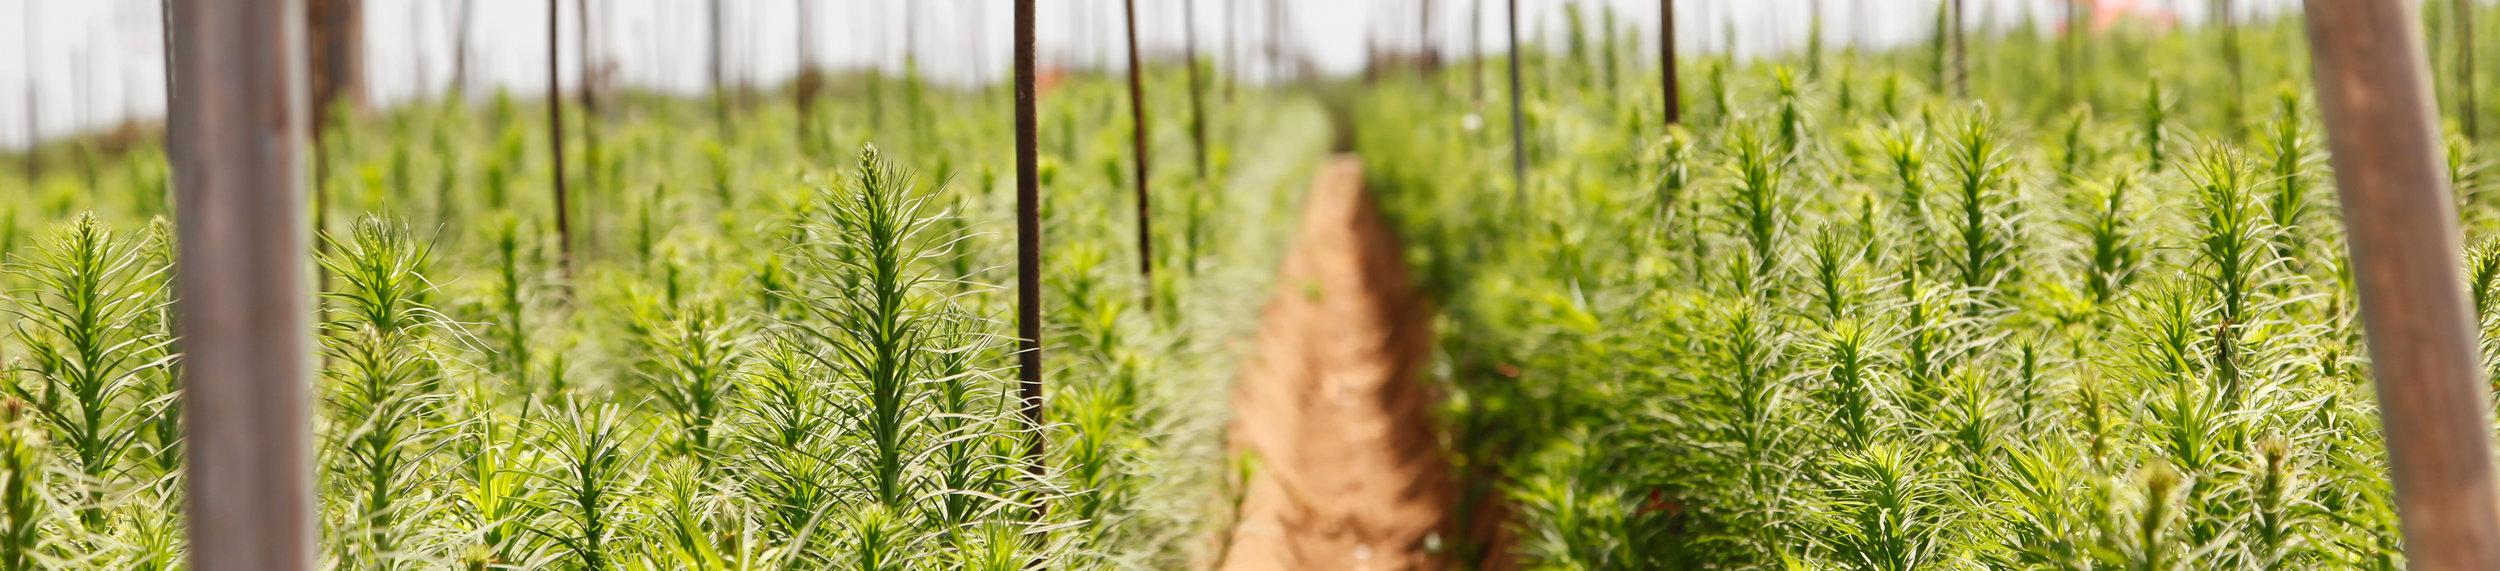 Farm Floral - Mellano and Company Farm Products